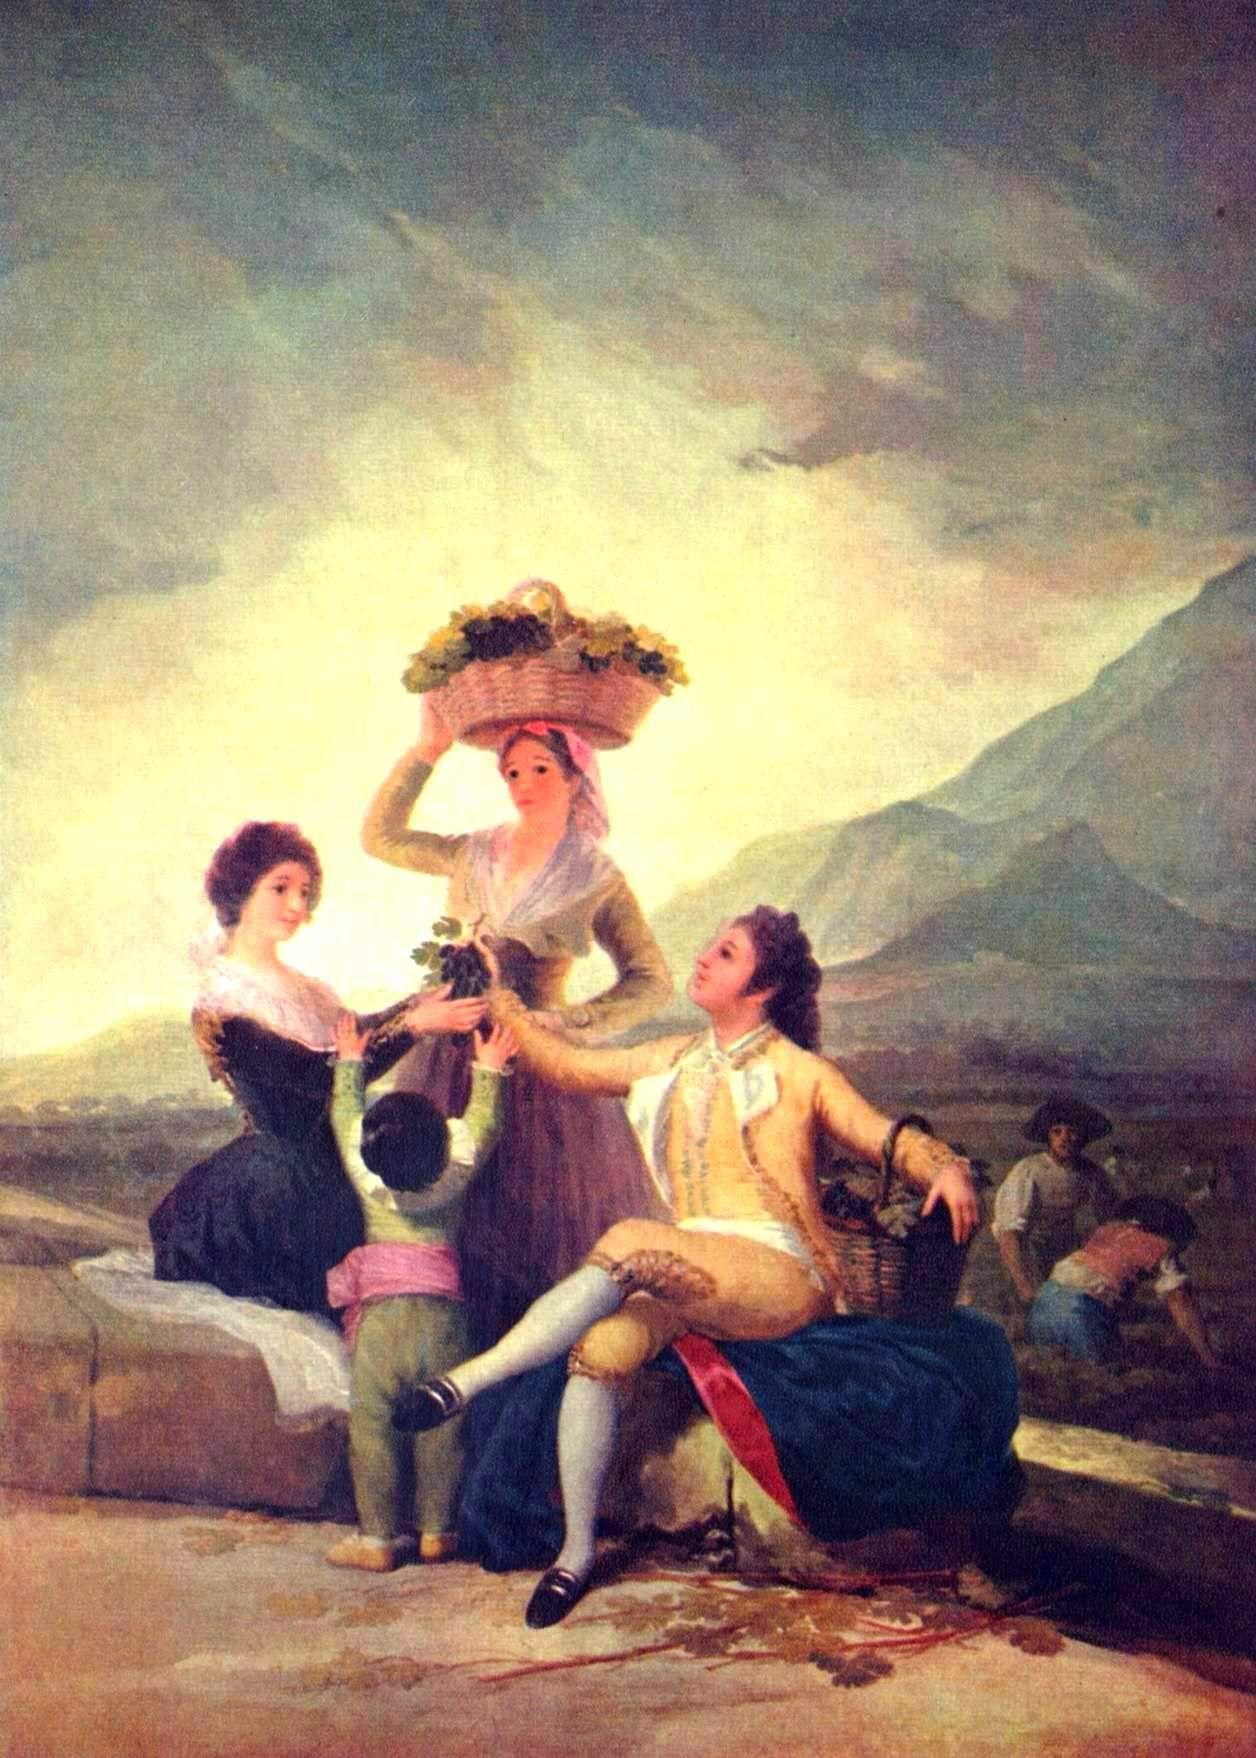 francisco goya and romanticism essay [ap art history] 19th century: romanticism, realism,  - romanticism challenges enlightenment's focus on factual  - romanticism - francisco goya - owls,.